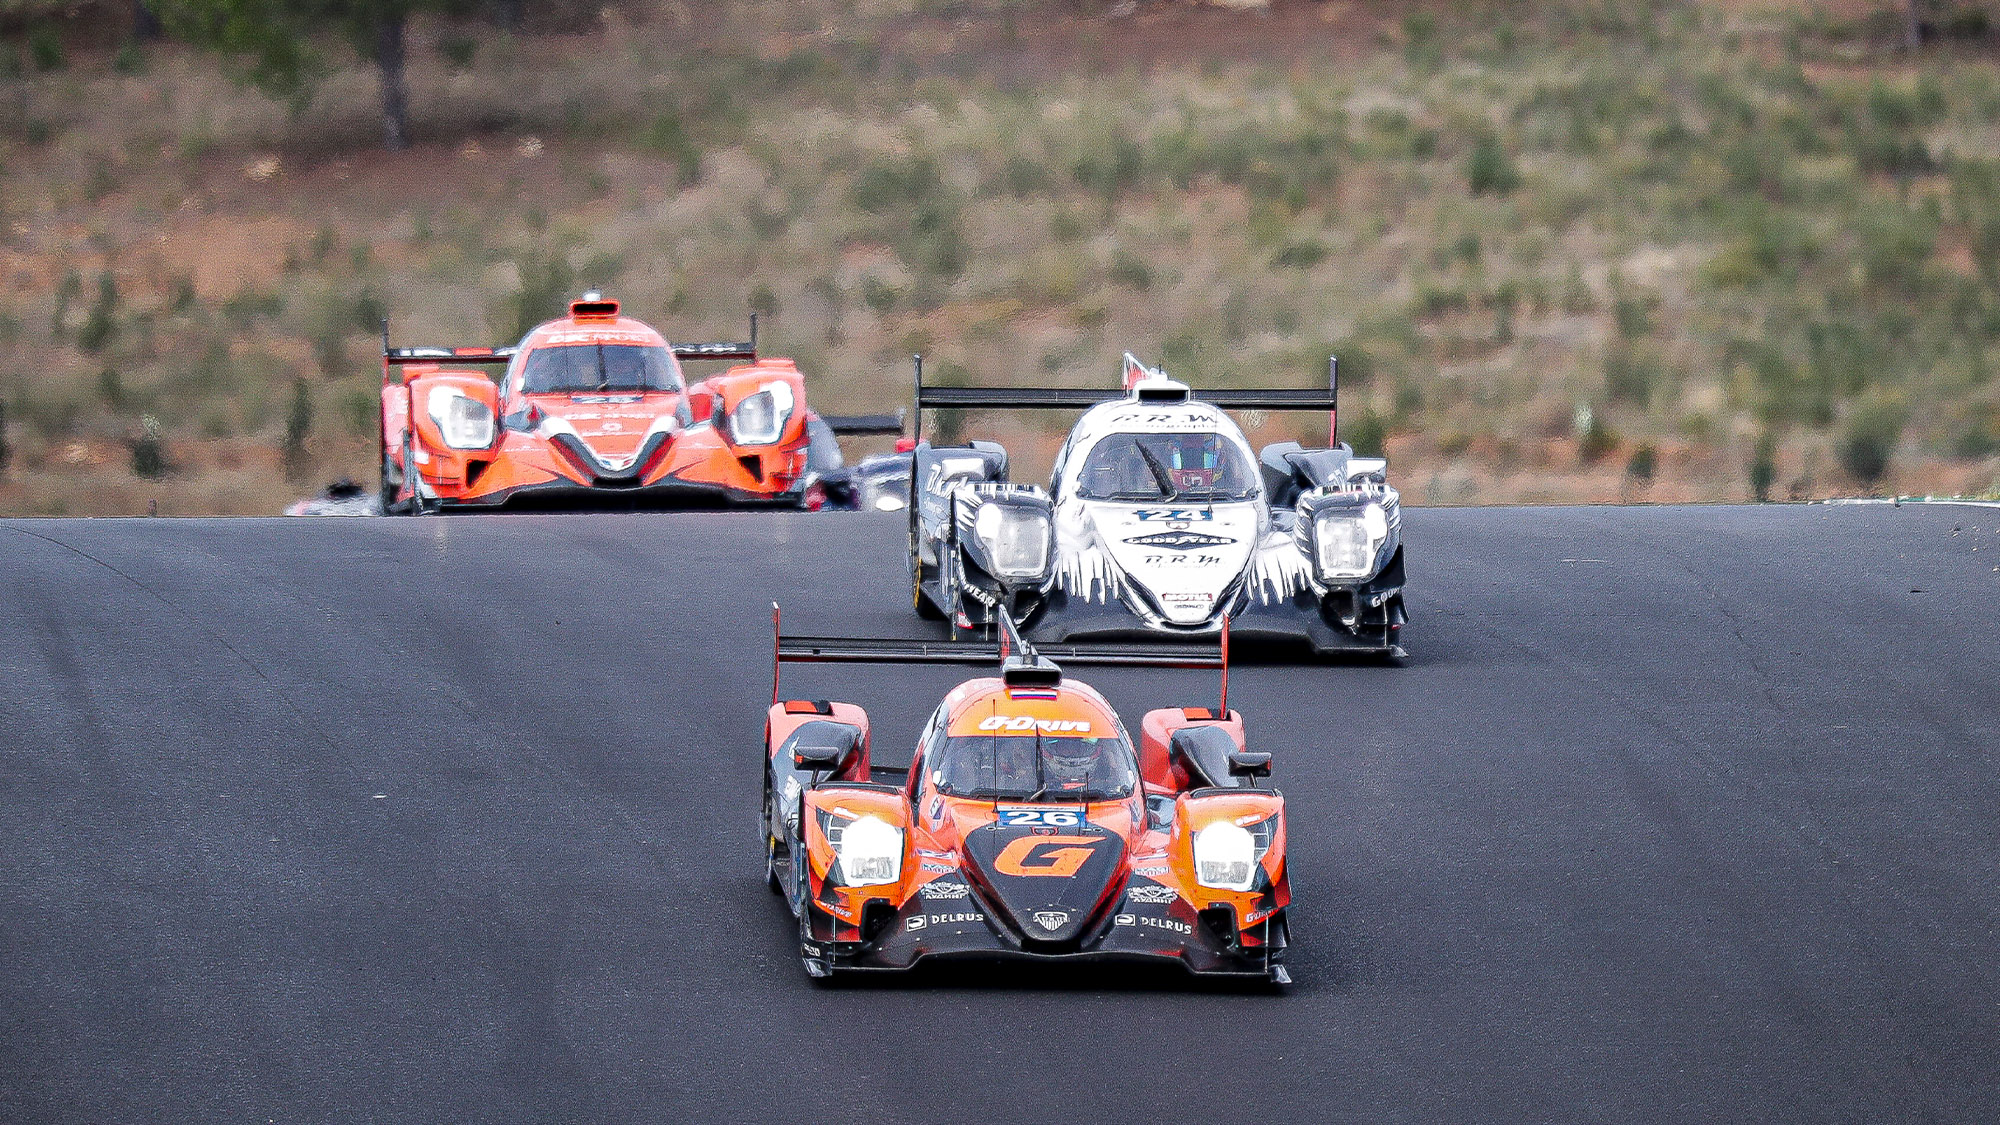 2020 European Le Mans Series at Portimao